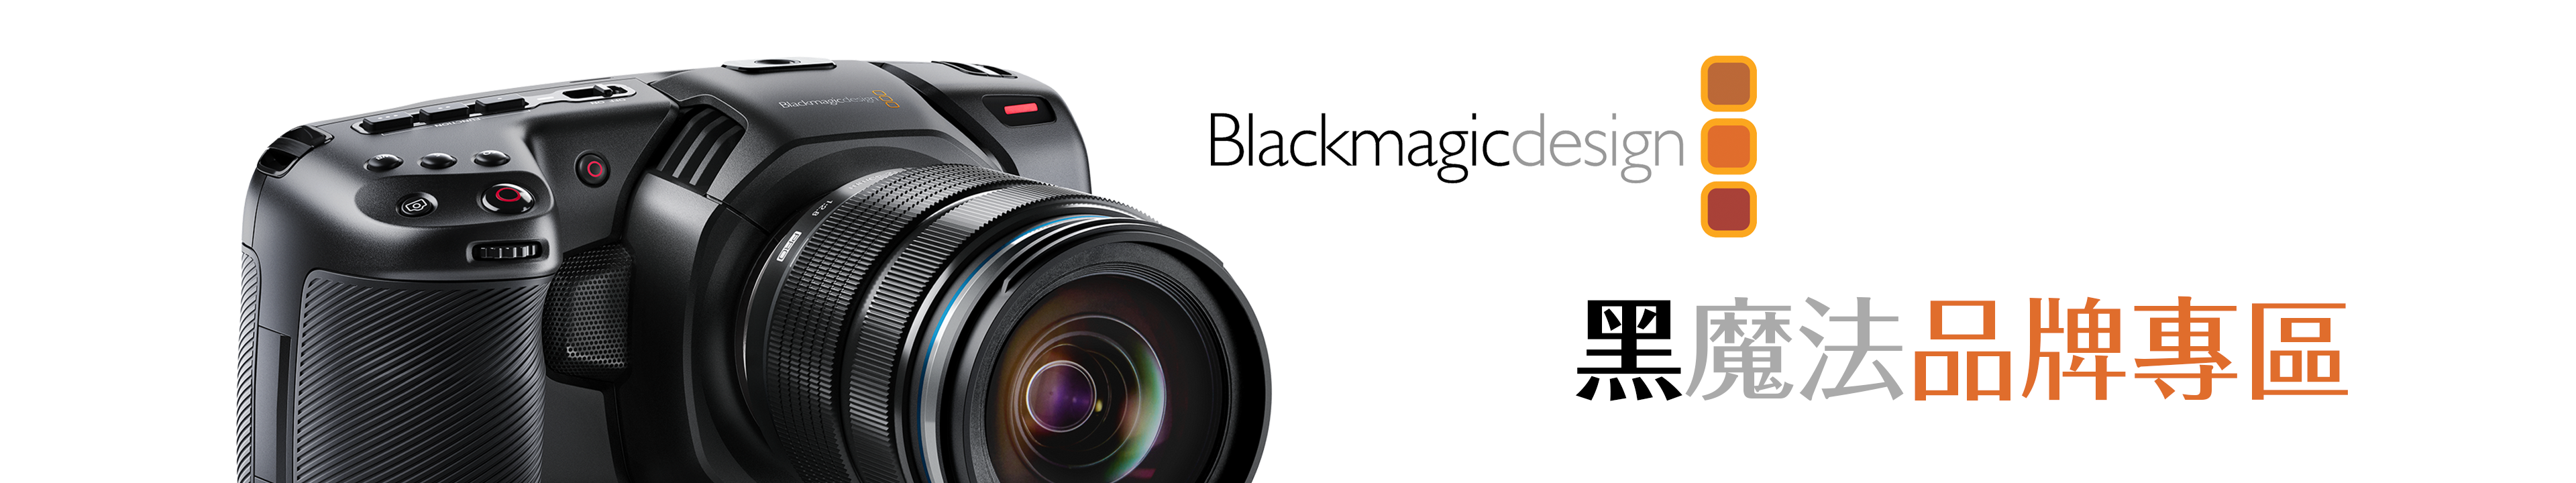 Blackmagic黑魔法品牌專區